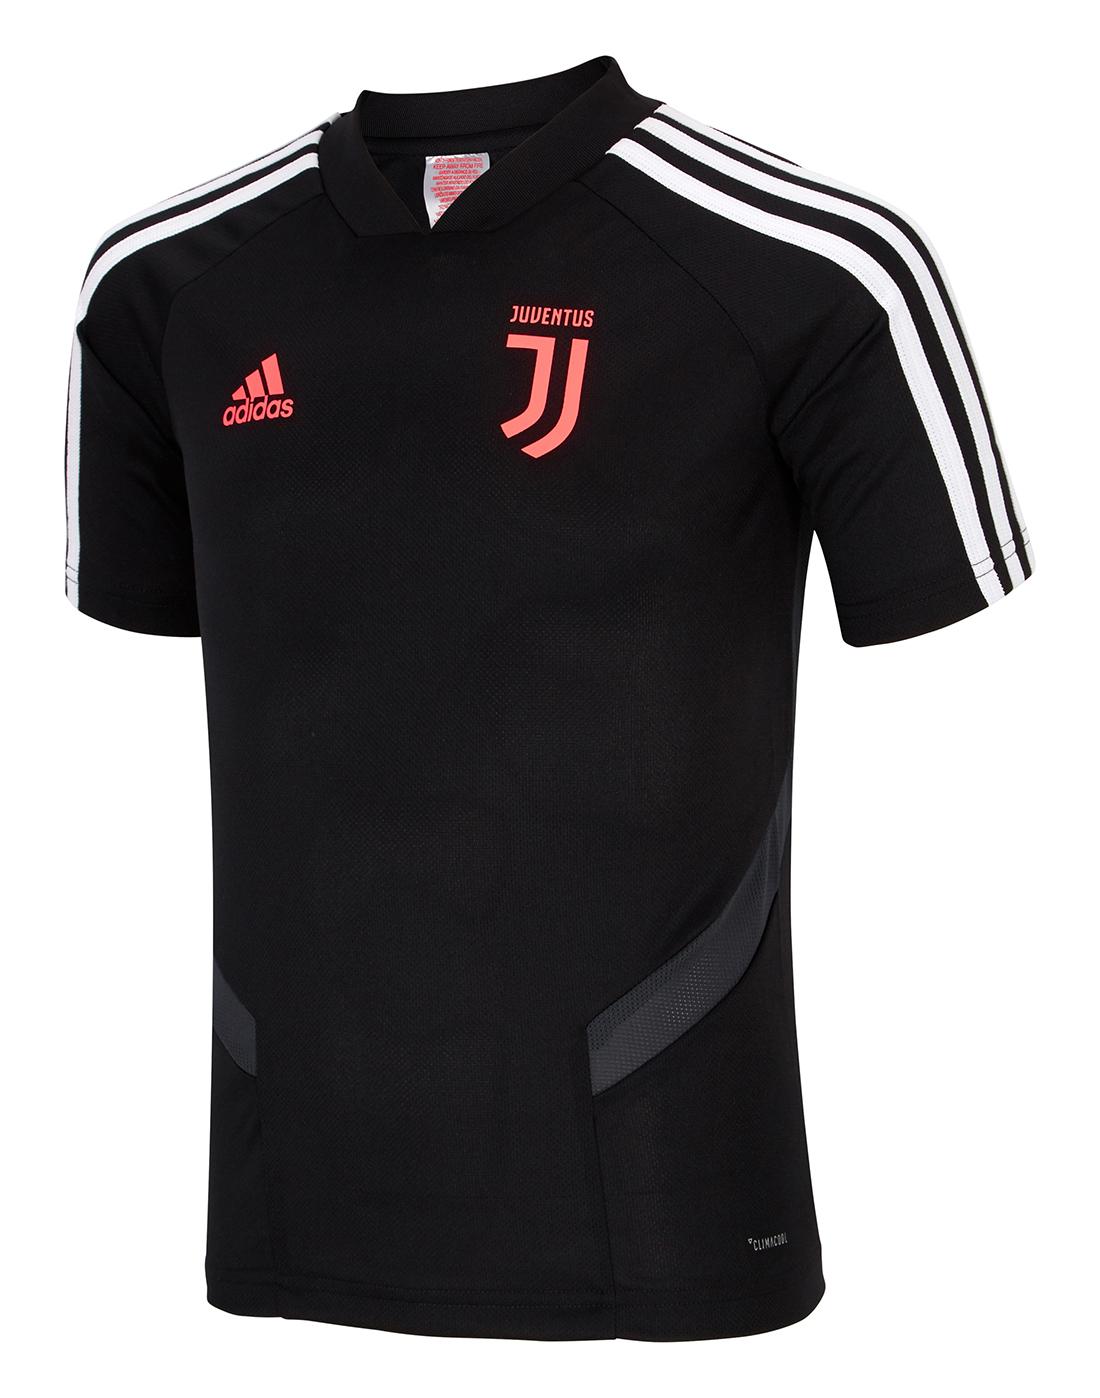 half off 421e6 ece91 adidas Kids Juventus Training Jersey